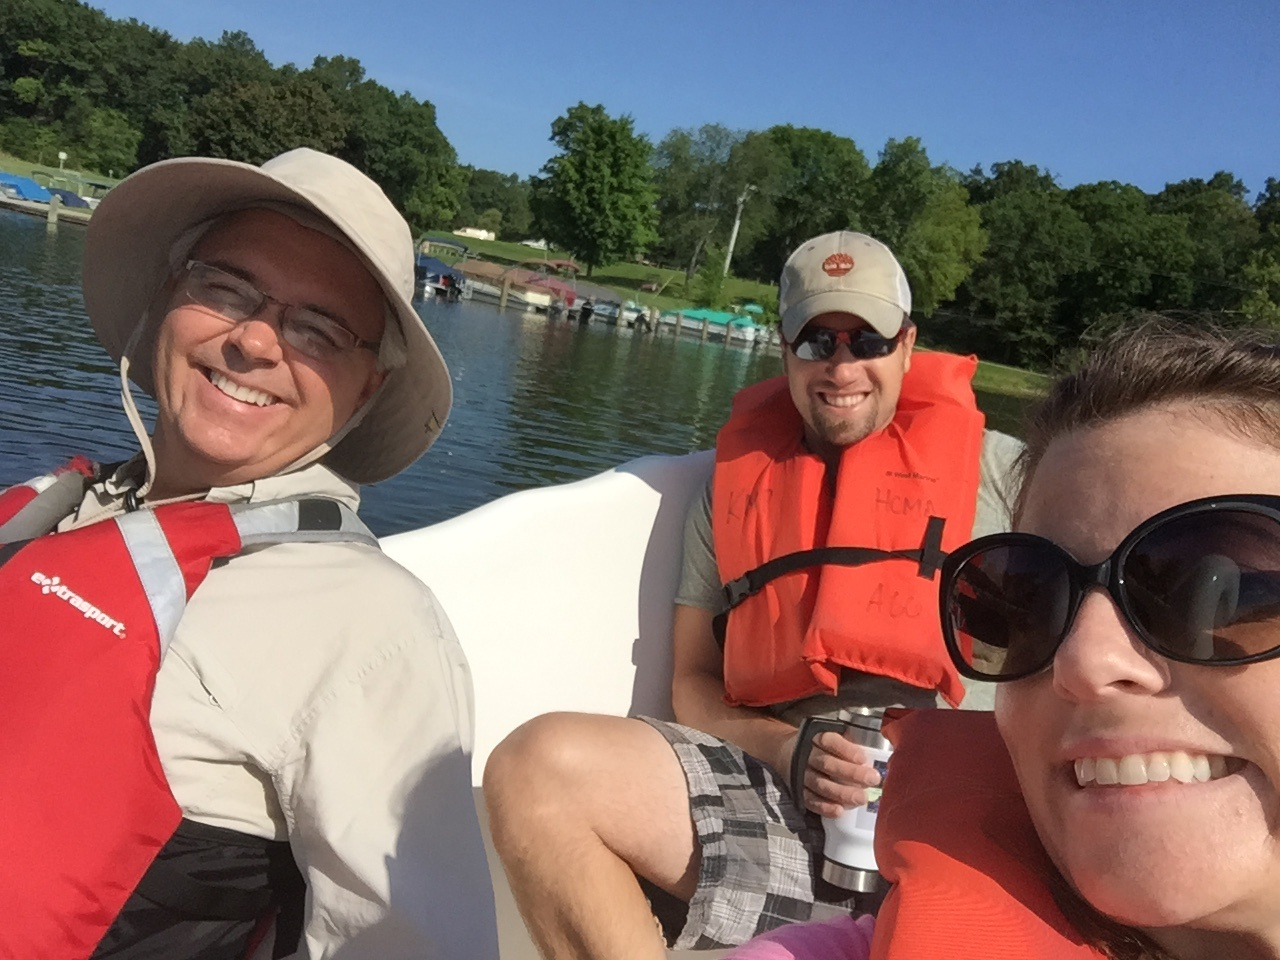 IGI team boating Kensington Metropark